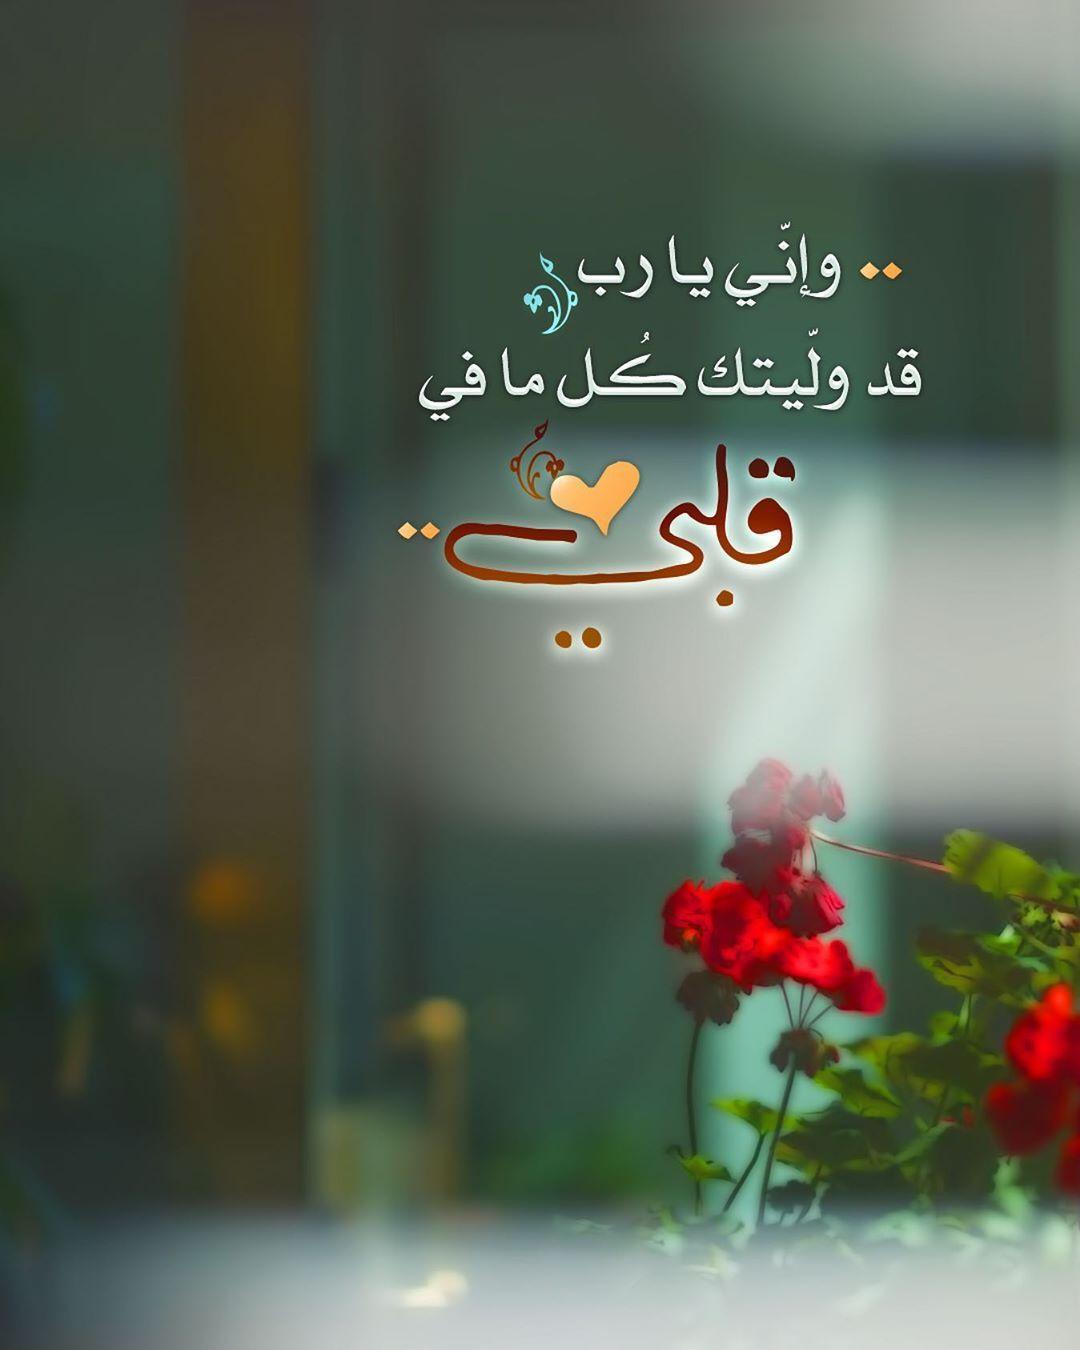 Pearla0203 On Instagram وإن ي يارب ق د ول يتك ك ل مافي ق لبي ㅤ تصبحون على خير Islamic Love Quotes Islamic Quotes Wallpaper Quran Quotes Love